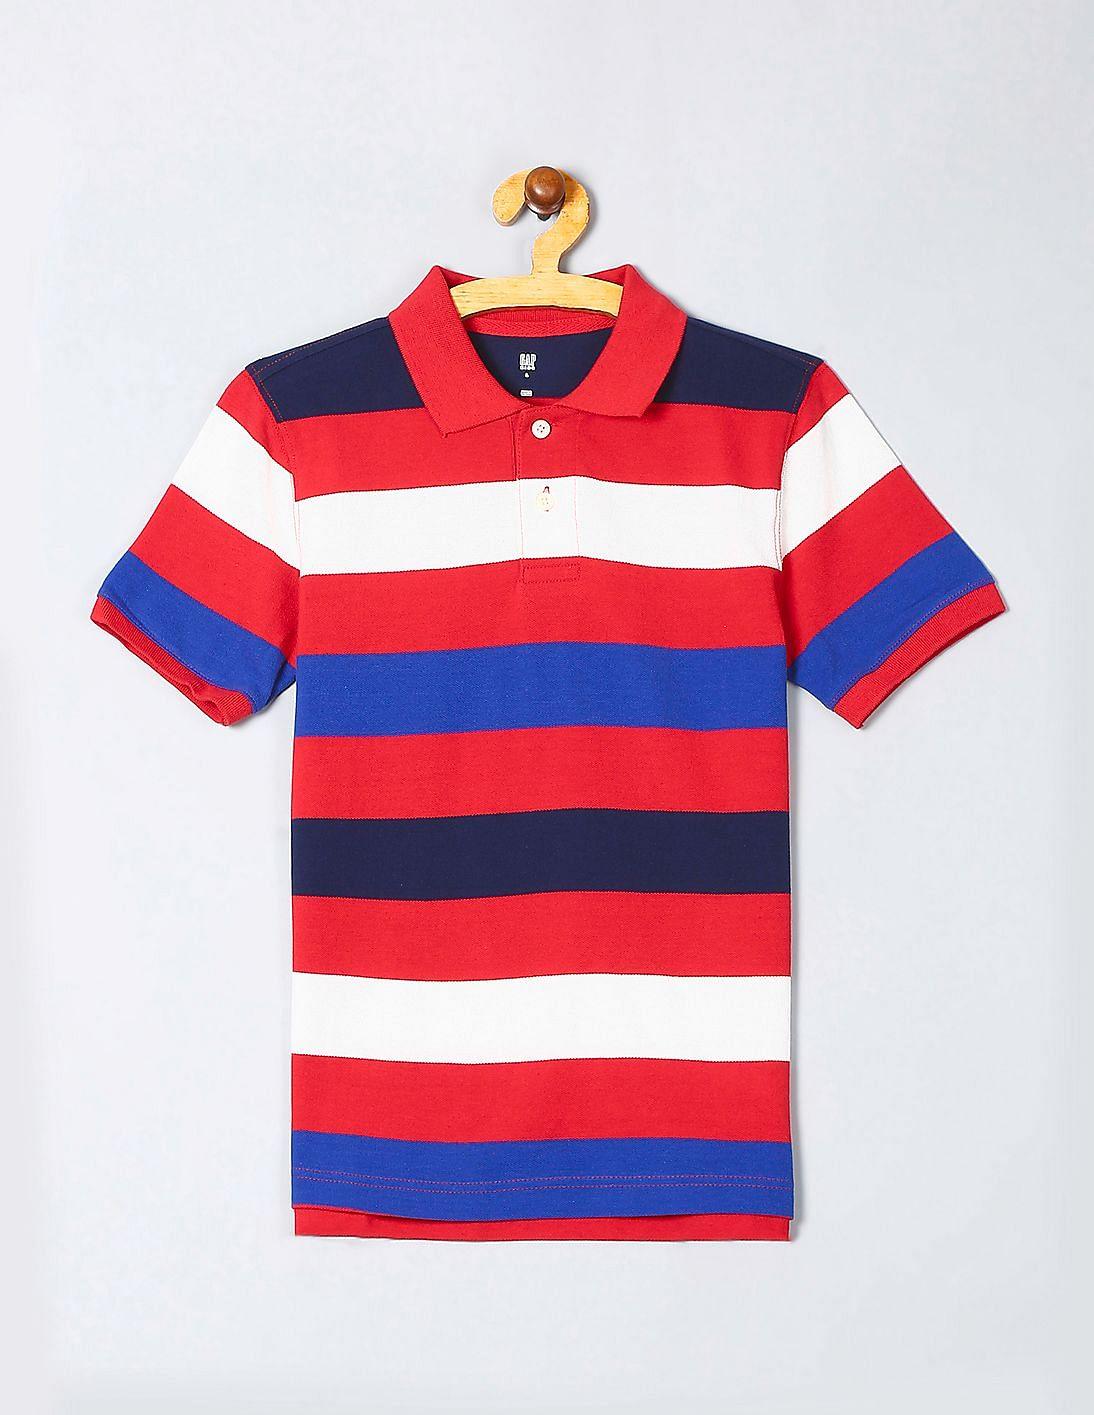 9b9527d5 Buy Boys 000000040022356600 Modern Red Boys T-Shirt online at ...